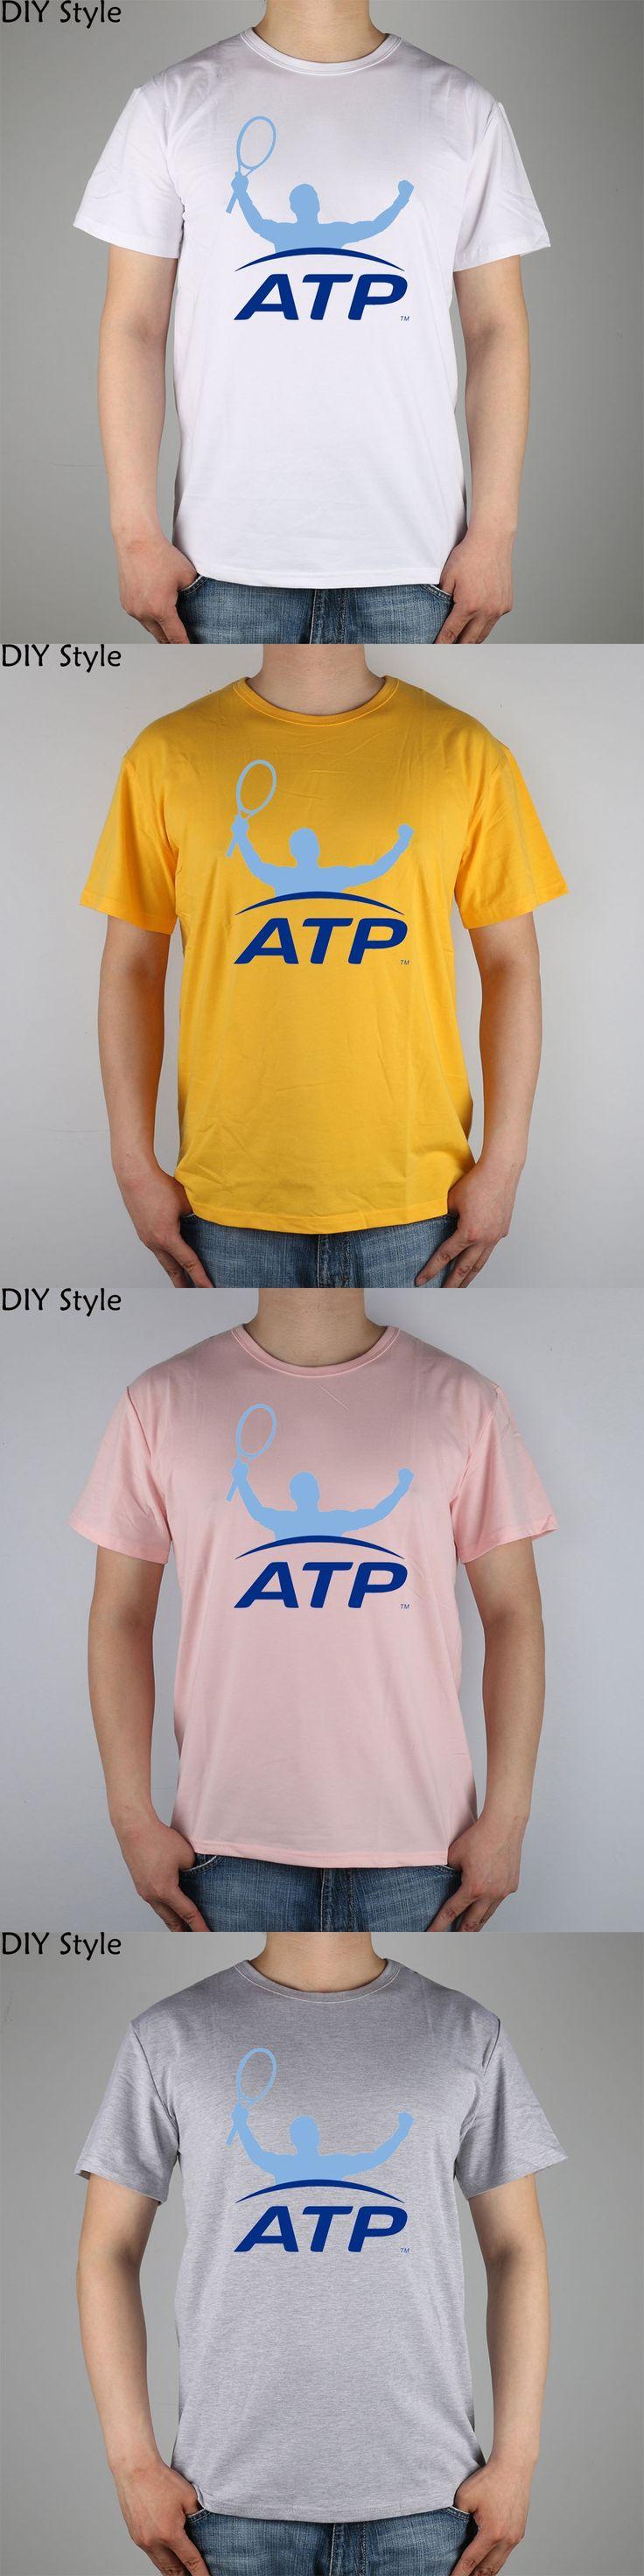 Grand Slam Roger Federer / Rafael Nadal / Mariasharapova t-shirt Top Lycra Cotton Men T Shirt Fashion Original Brand New